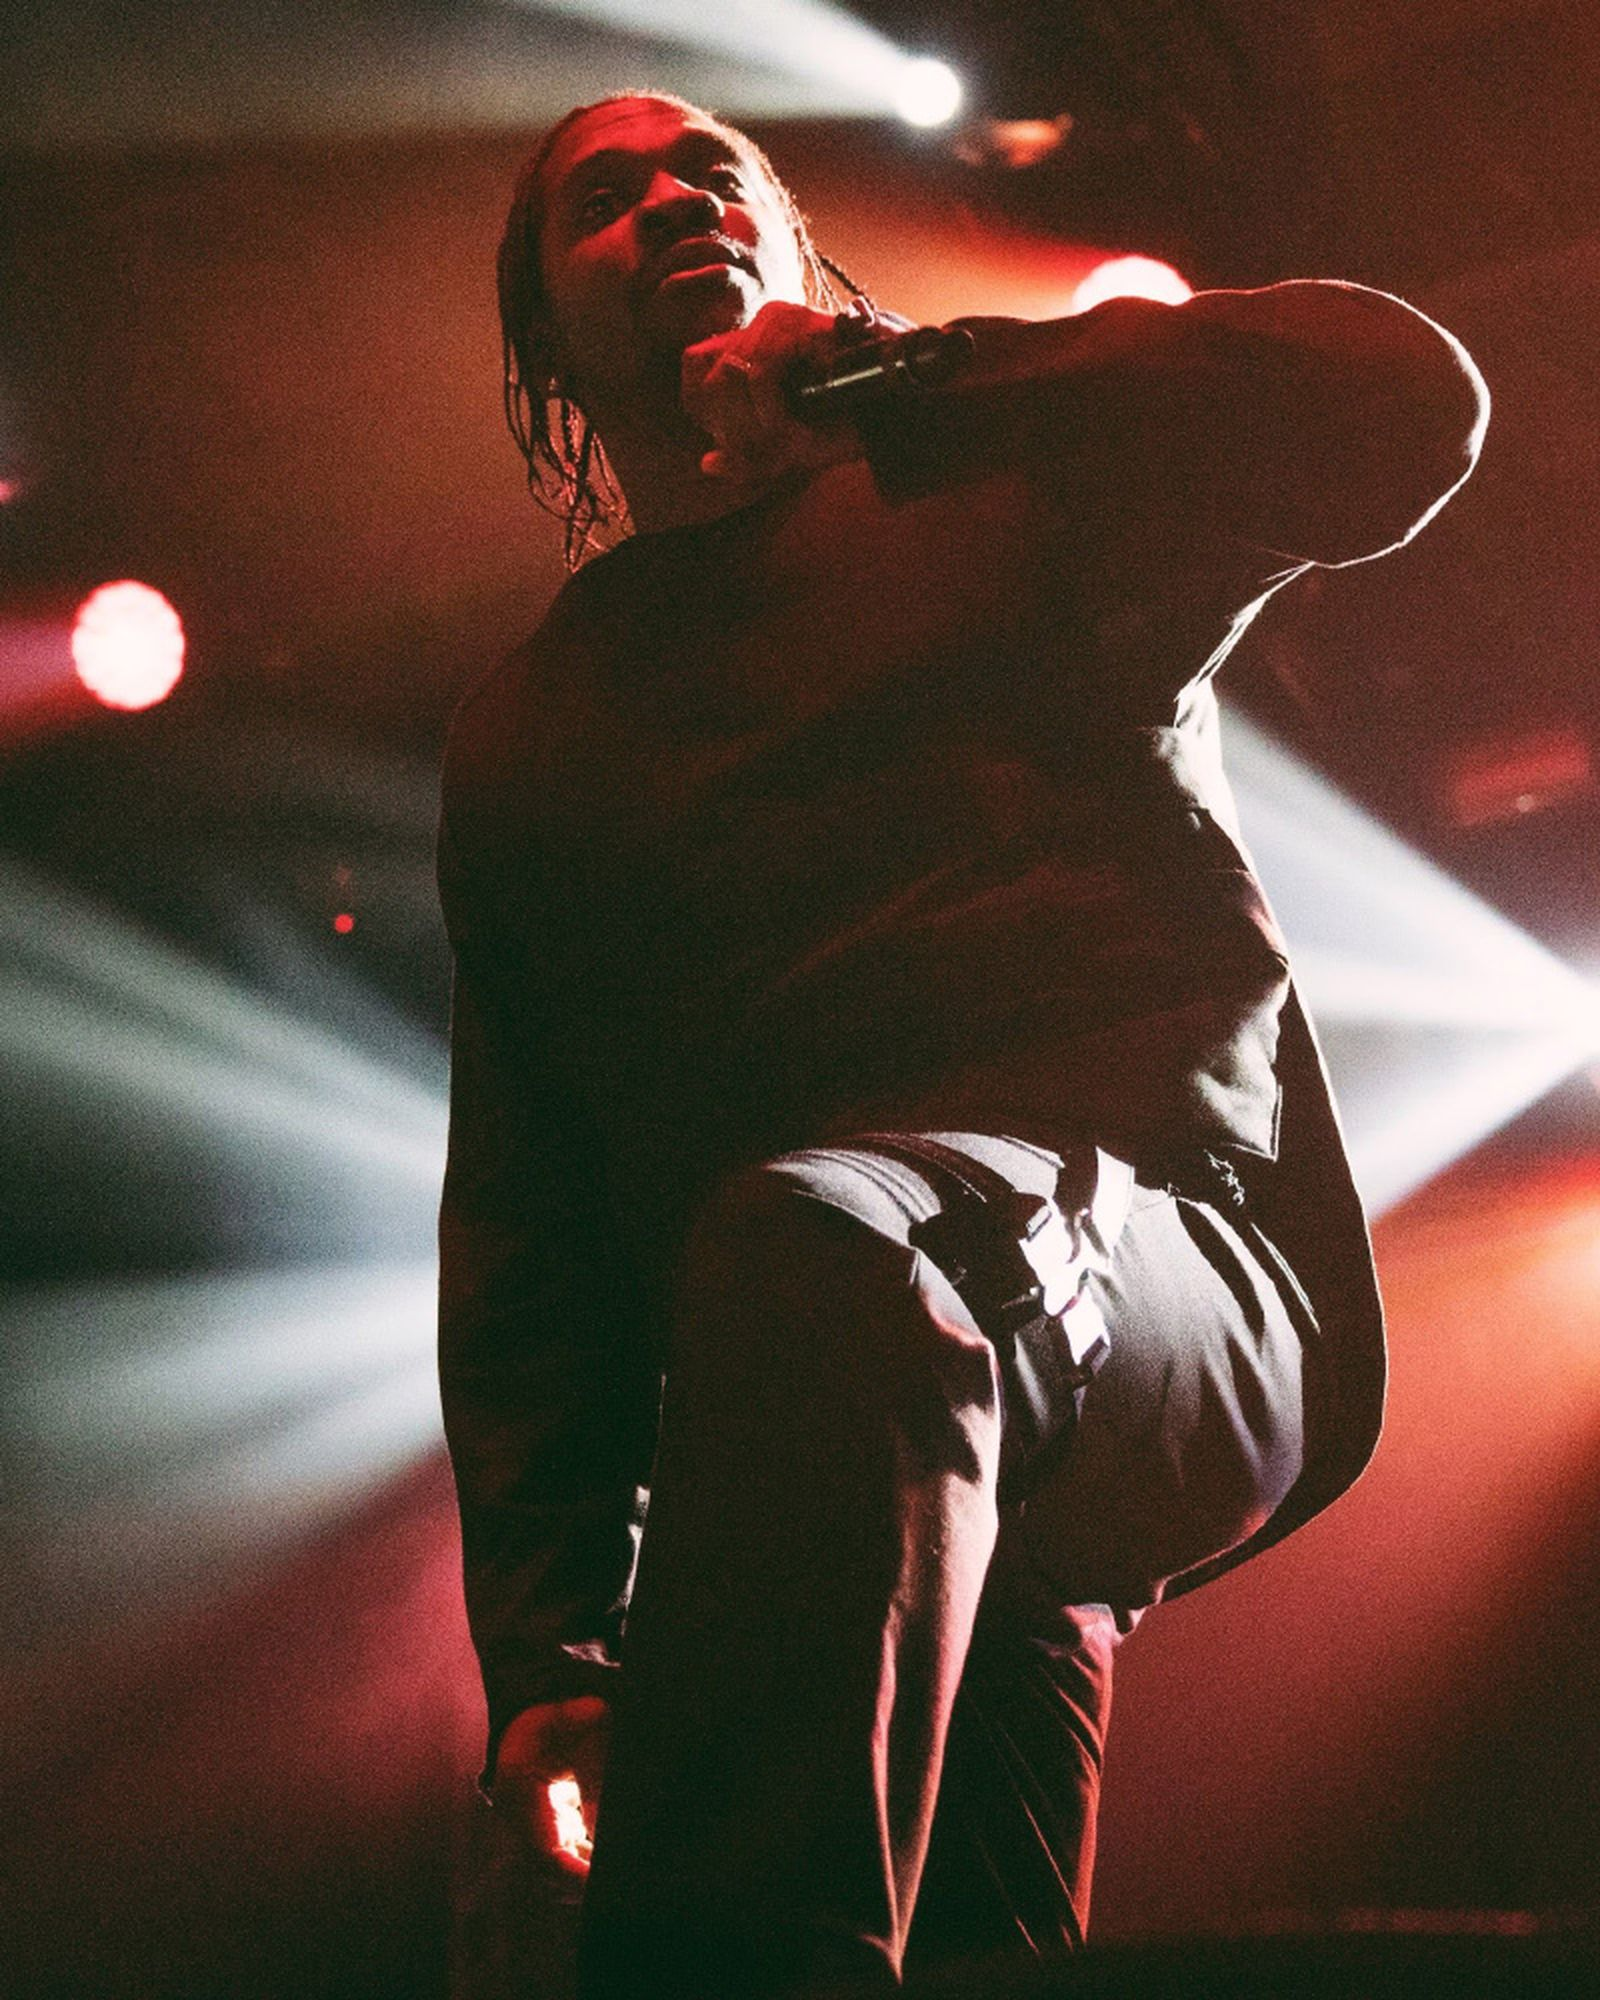 2019 grammys predictions 2019 Grammy Awards Cardi B bradley cooper